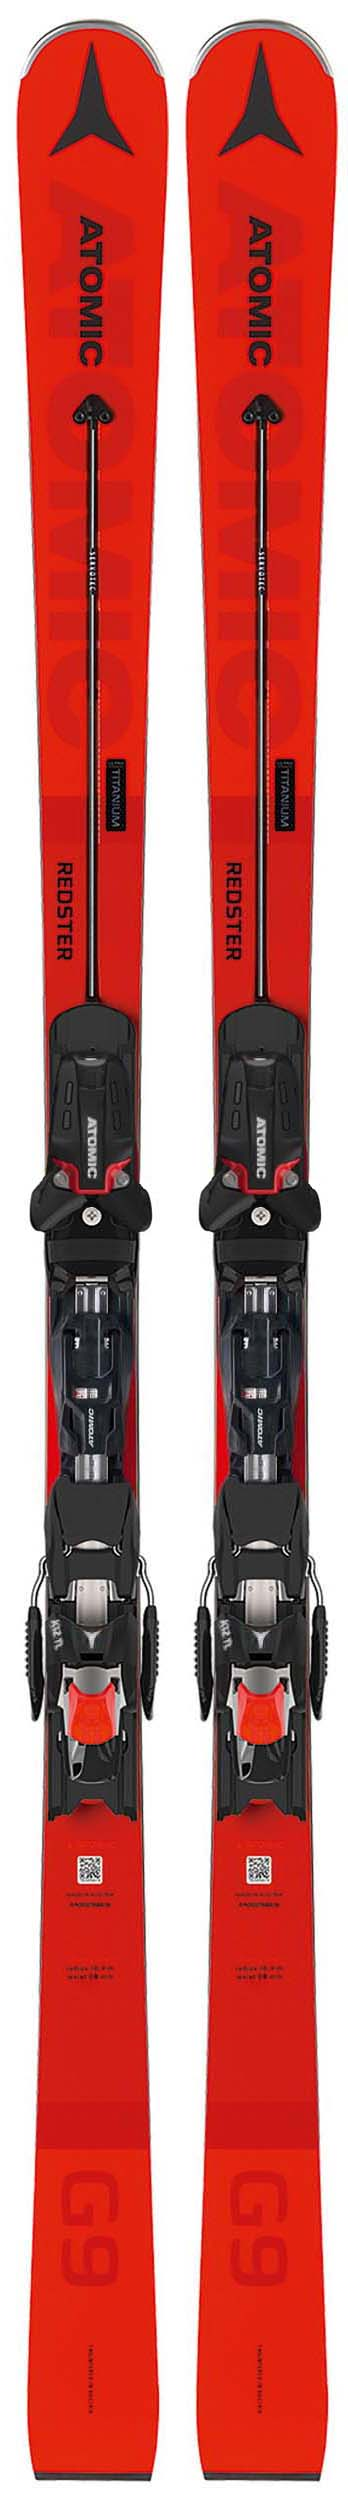 Atomic 2020 Redster G9 GS Q1 Skis w/X12 TL Bindings NEW !! 171,177,183cm